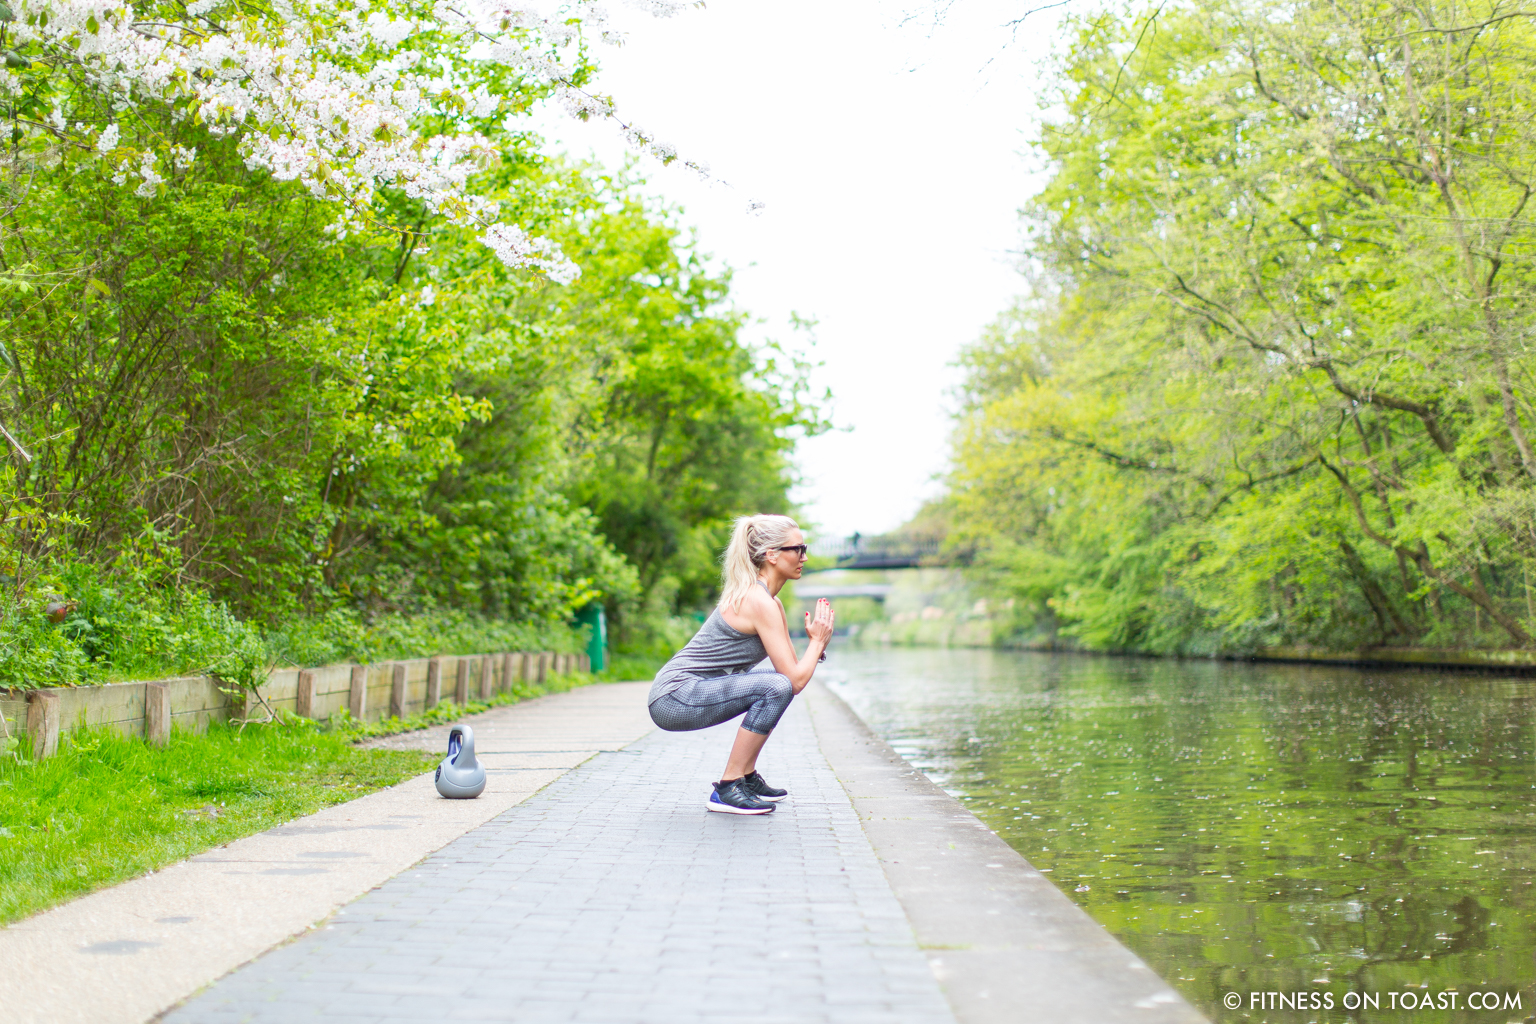 Fitness On Toast Faya Blog Girl Healthy Workout Regents Canal London Kettle Bell Squat Swing Lunge Twist Burpees Old Navy Fashion OOTD Gap Chanel Celine-2